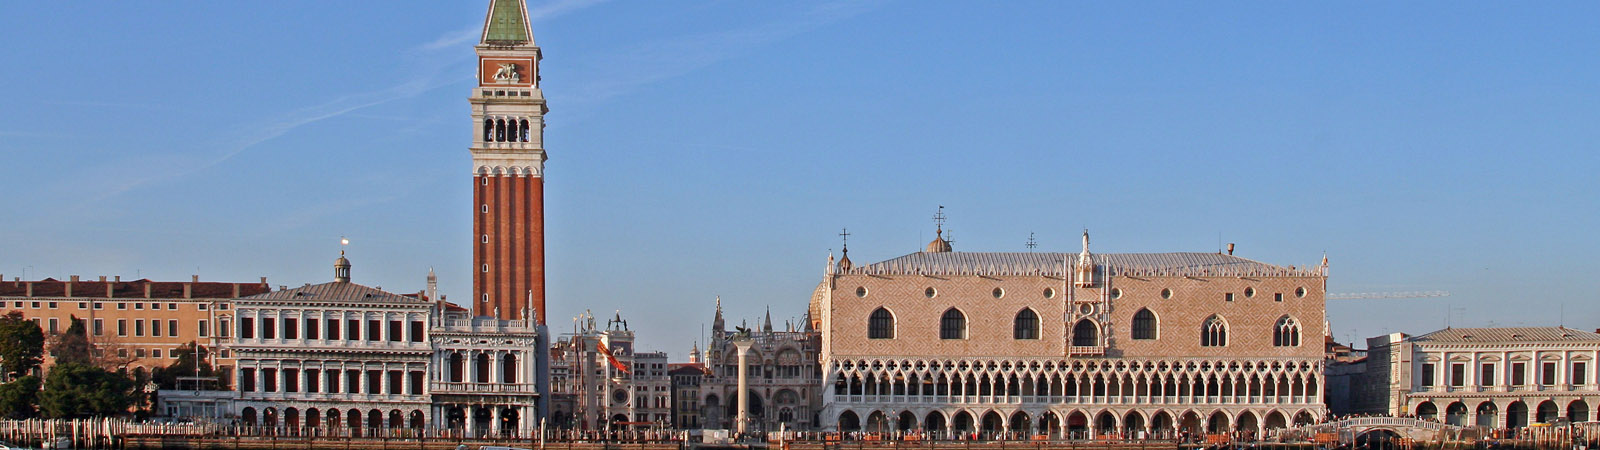 Hotel Flora Venice - Official Website - Best Rate Guarantee